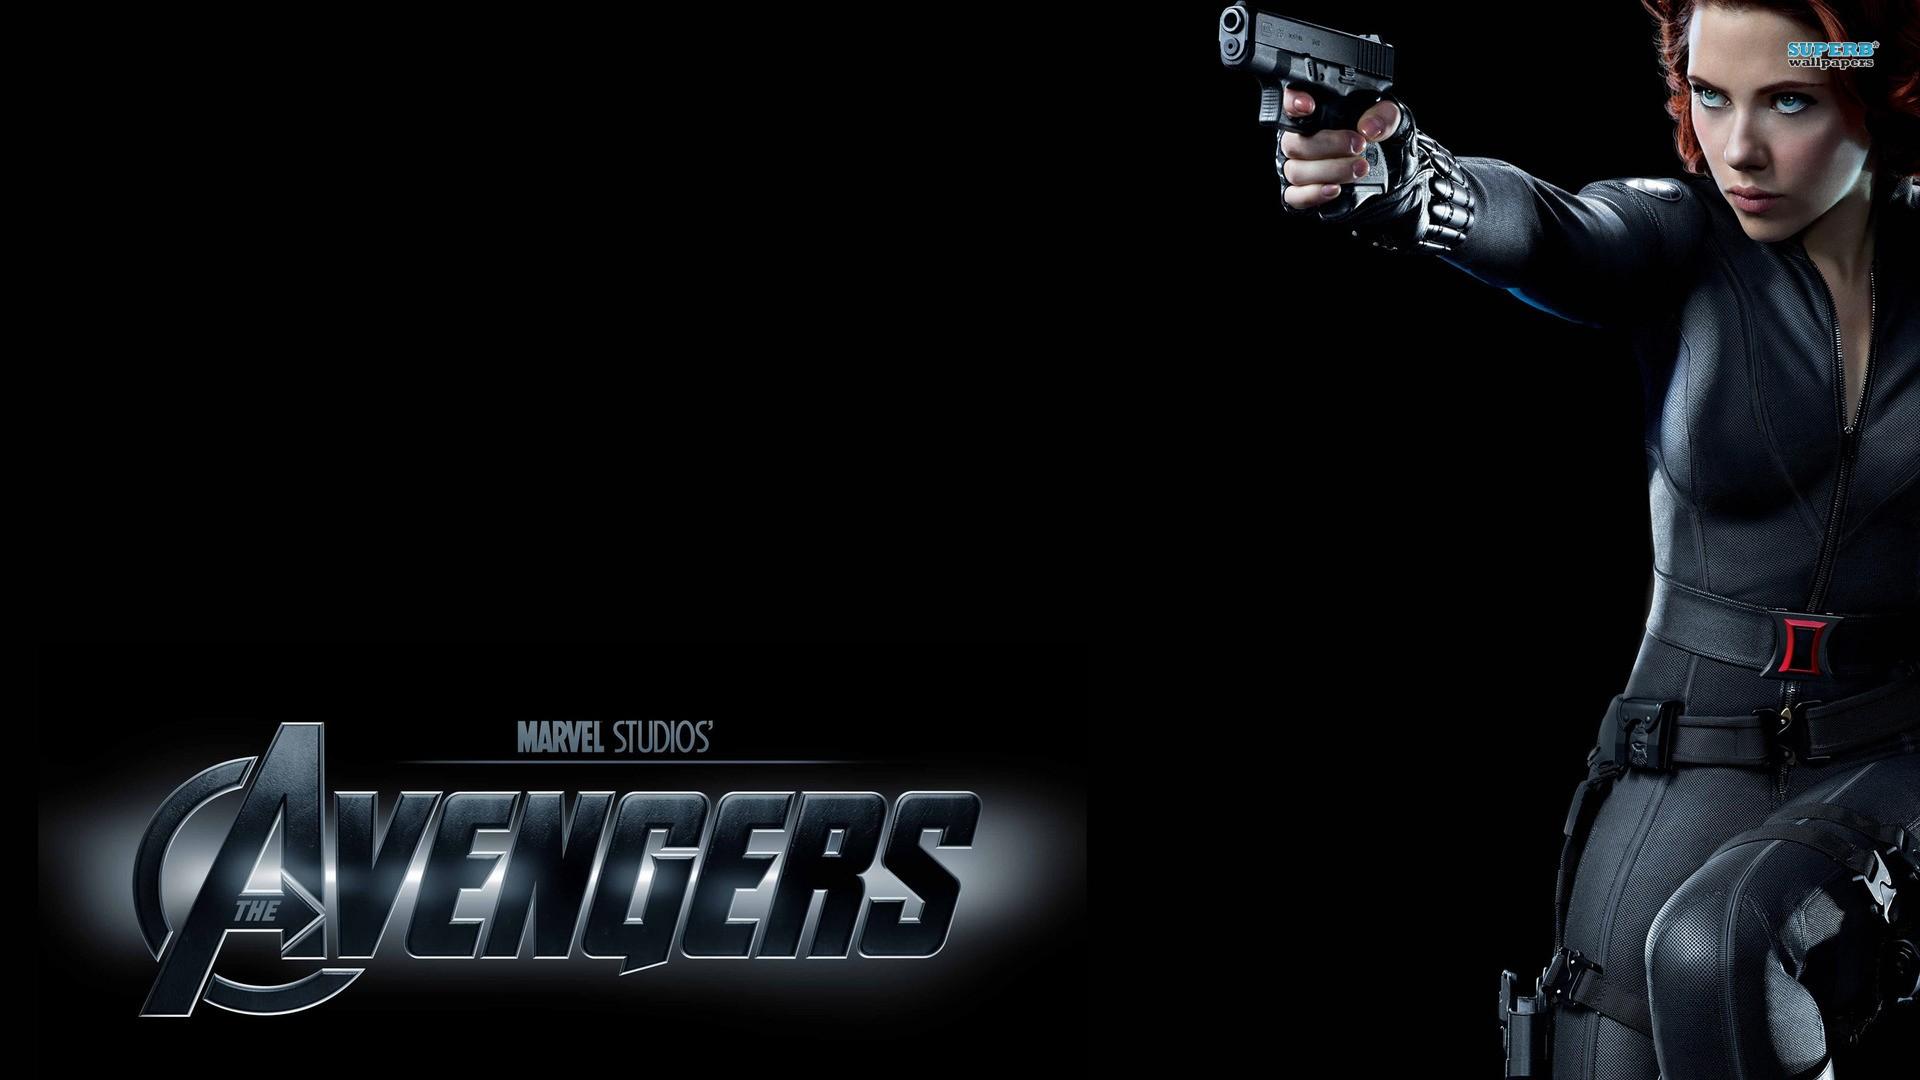 Wallpaper The Avengers Scarlett Johansson Black Widow